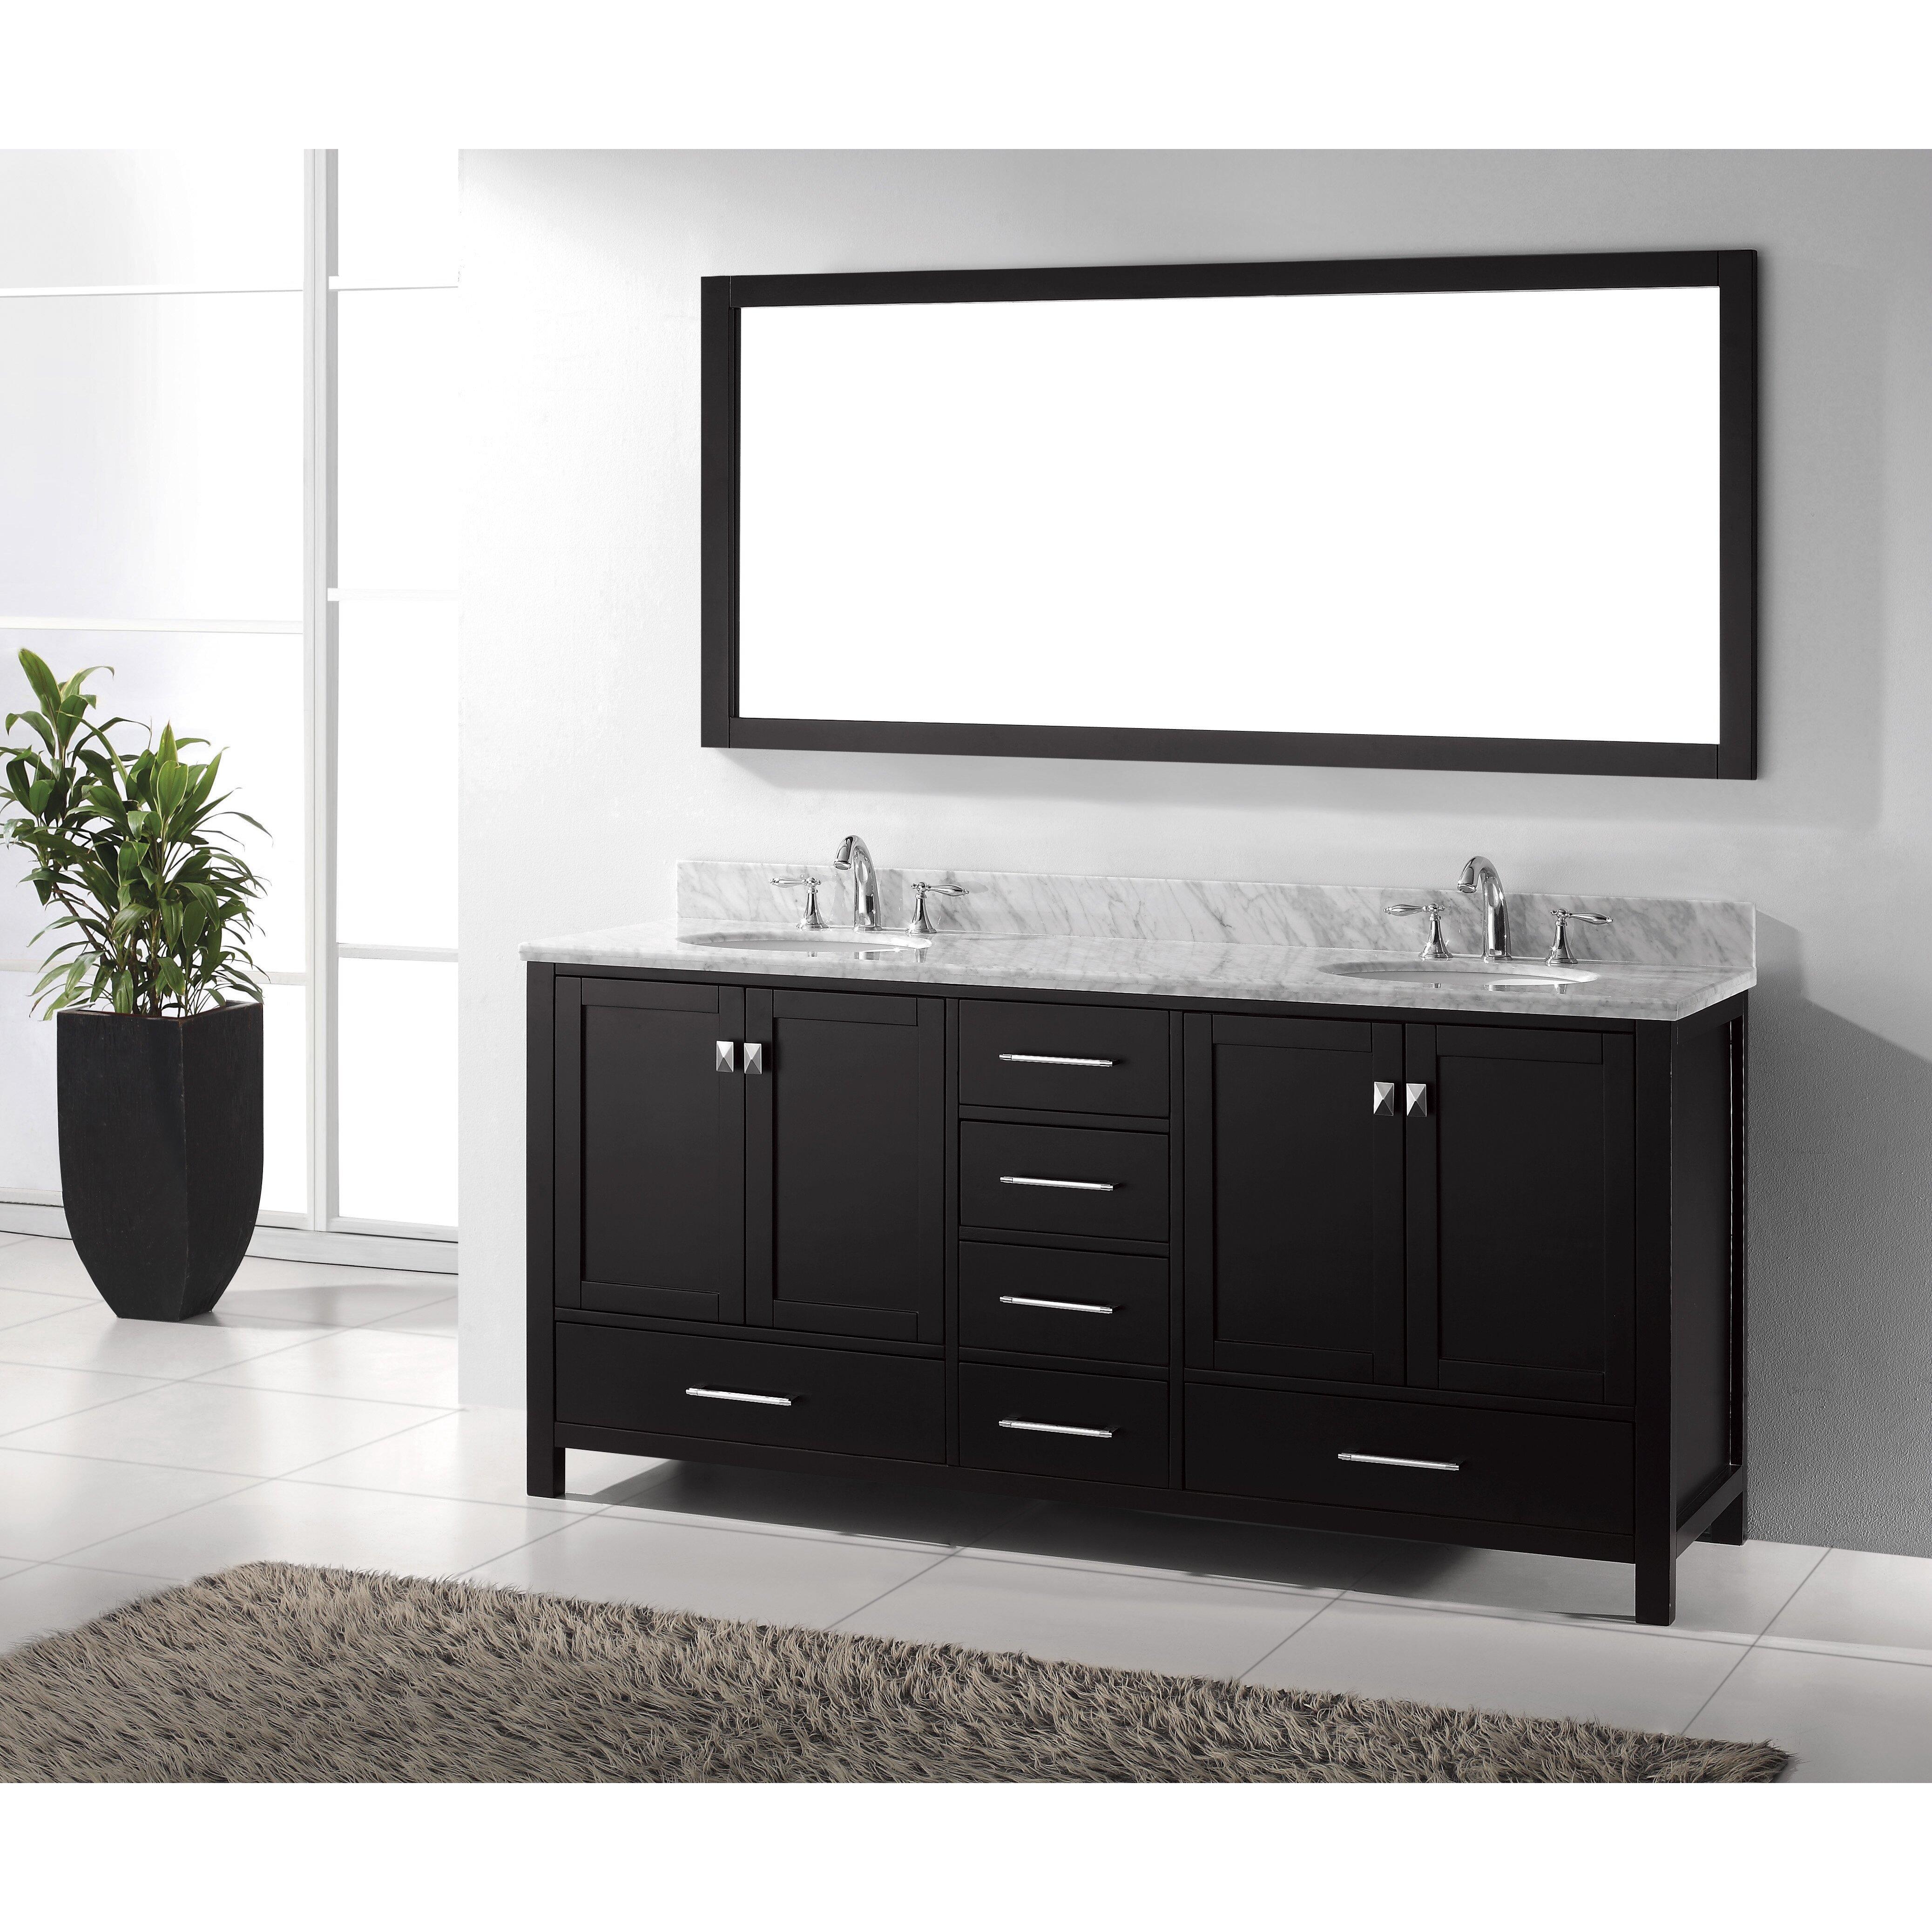 virtu caroline avenue 72 8 quot bathroom vanity set with carrara white top and mirror